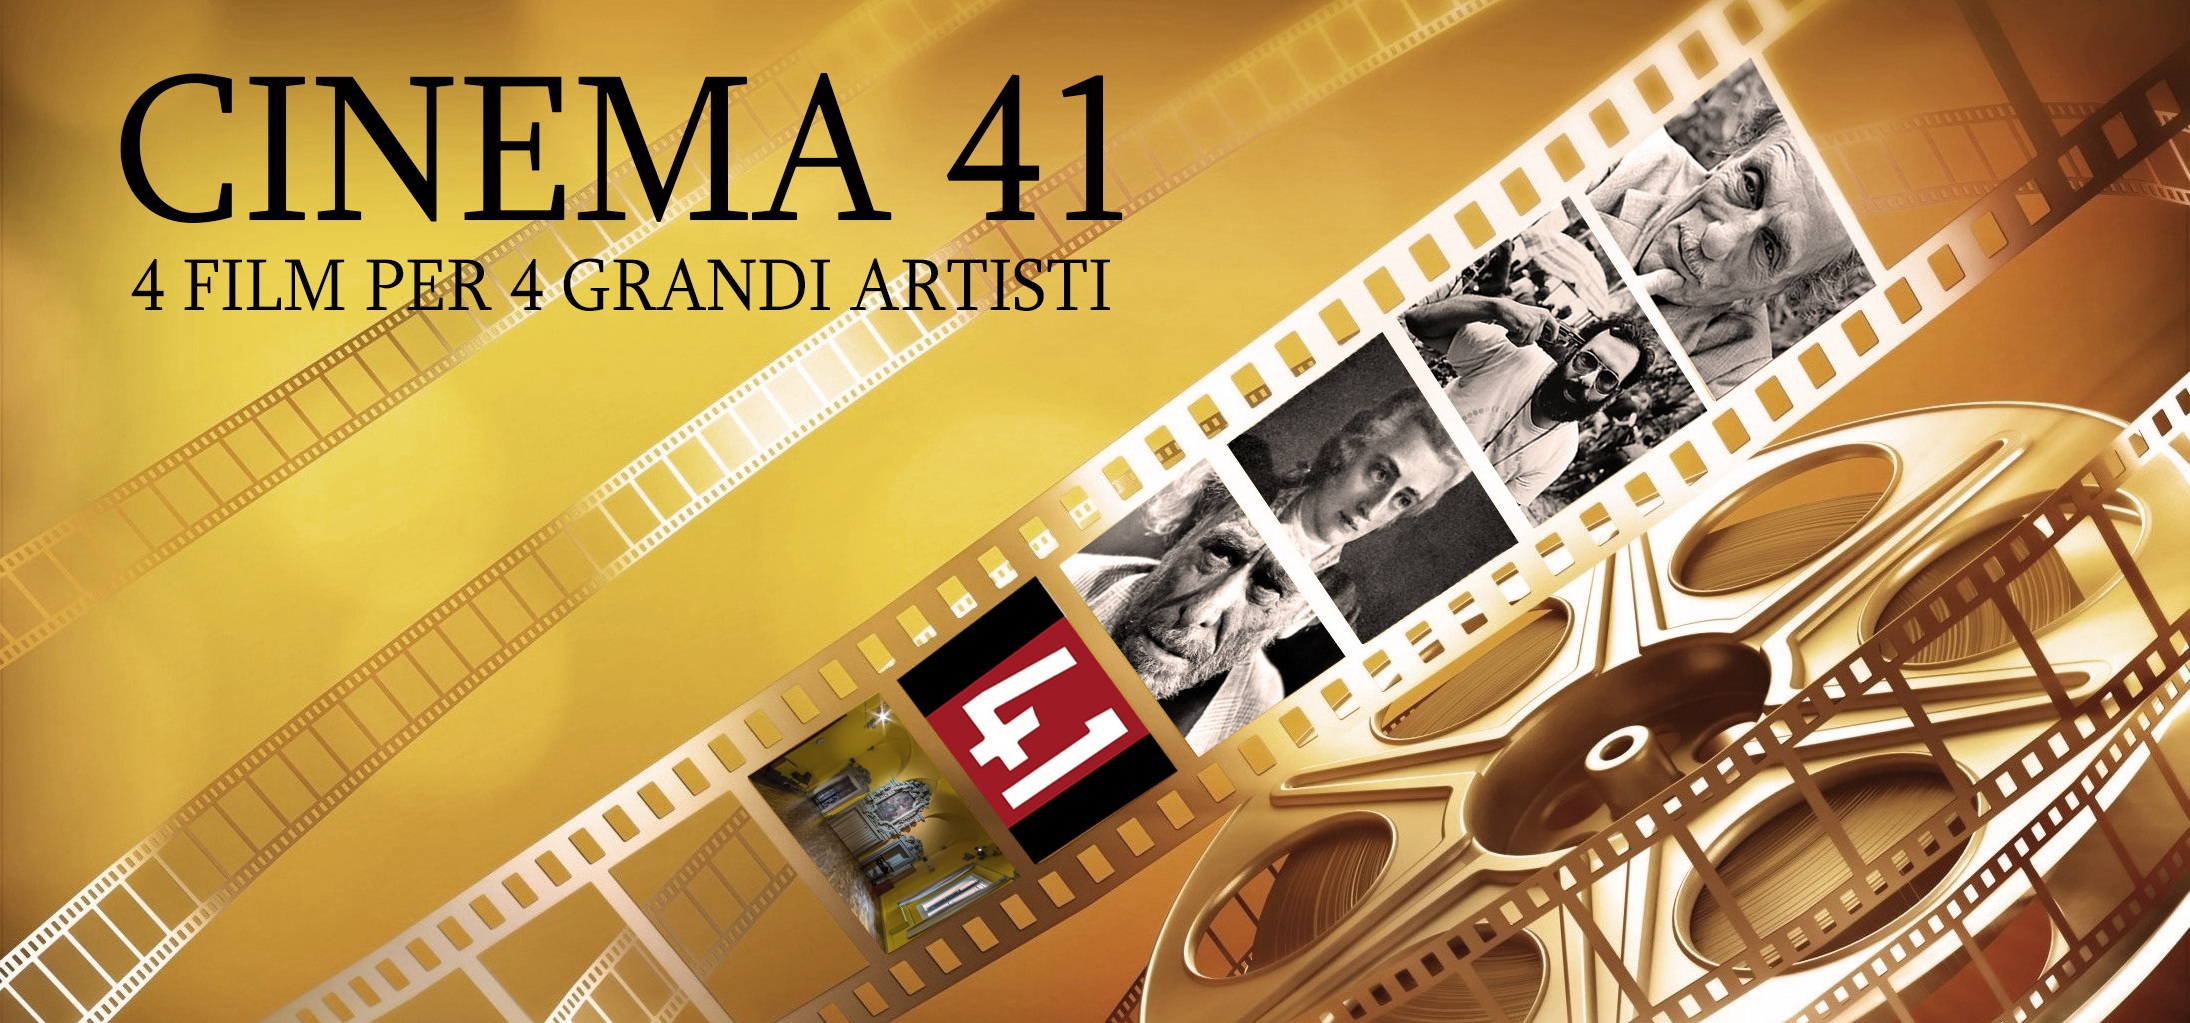 CINEMA 41